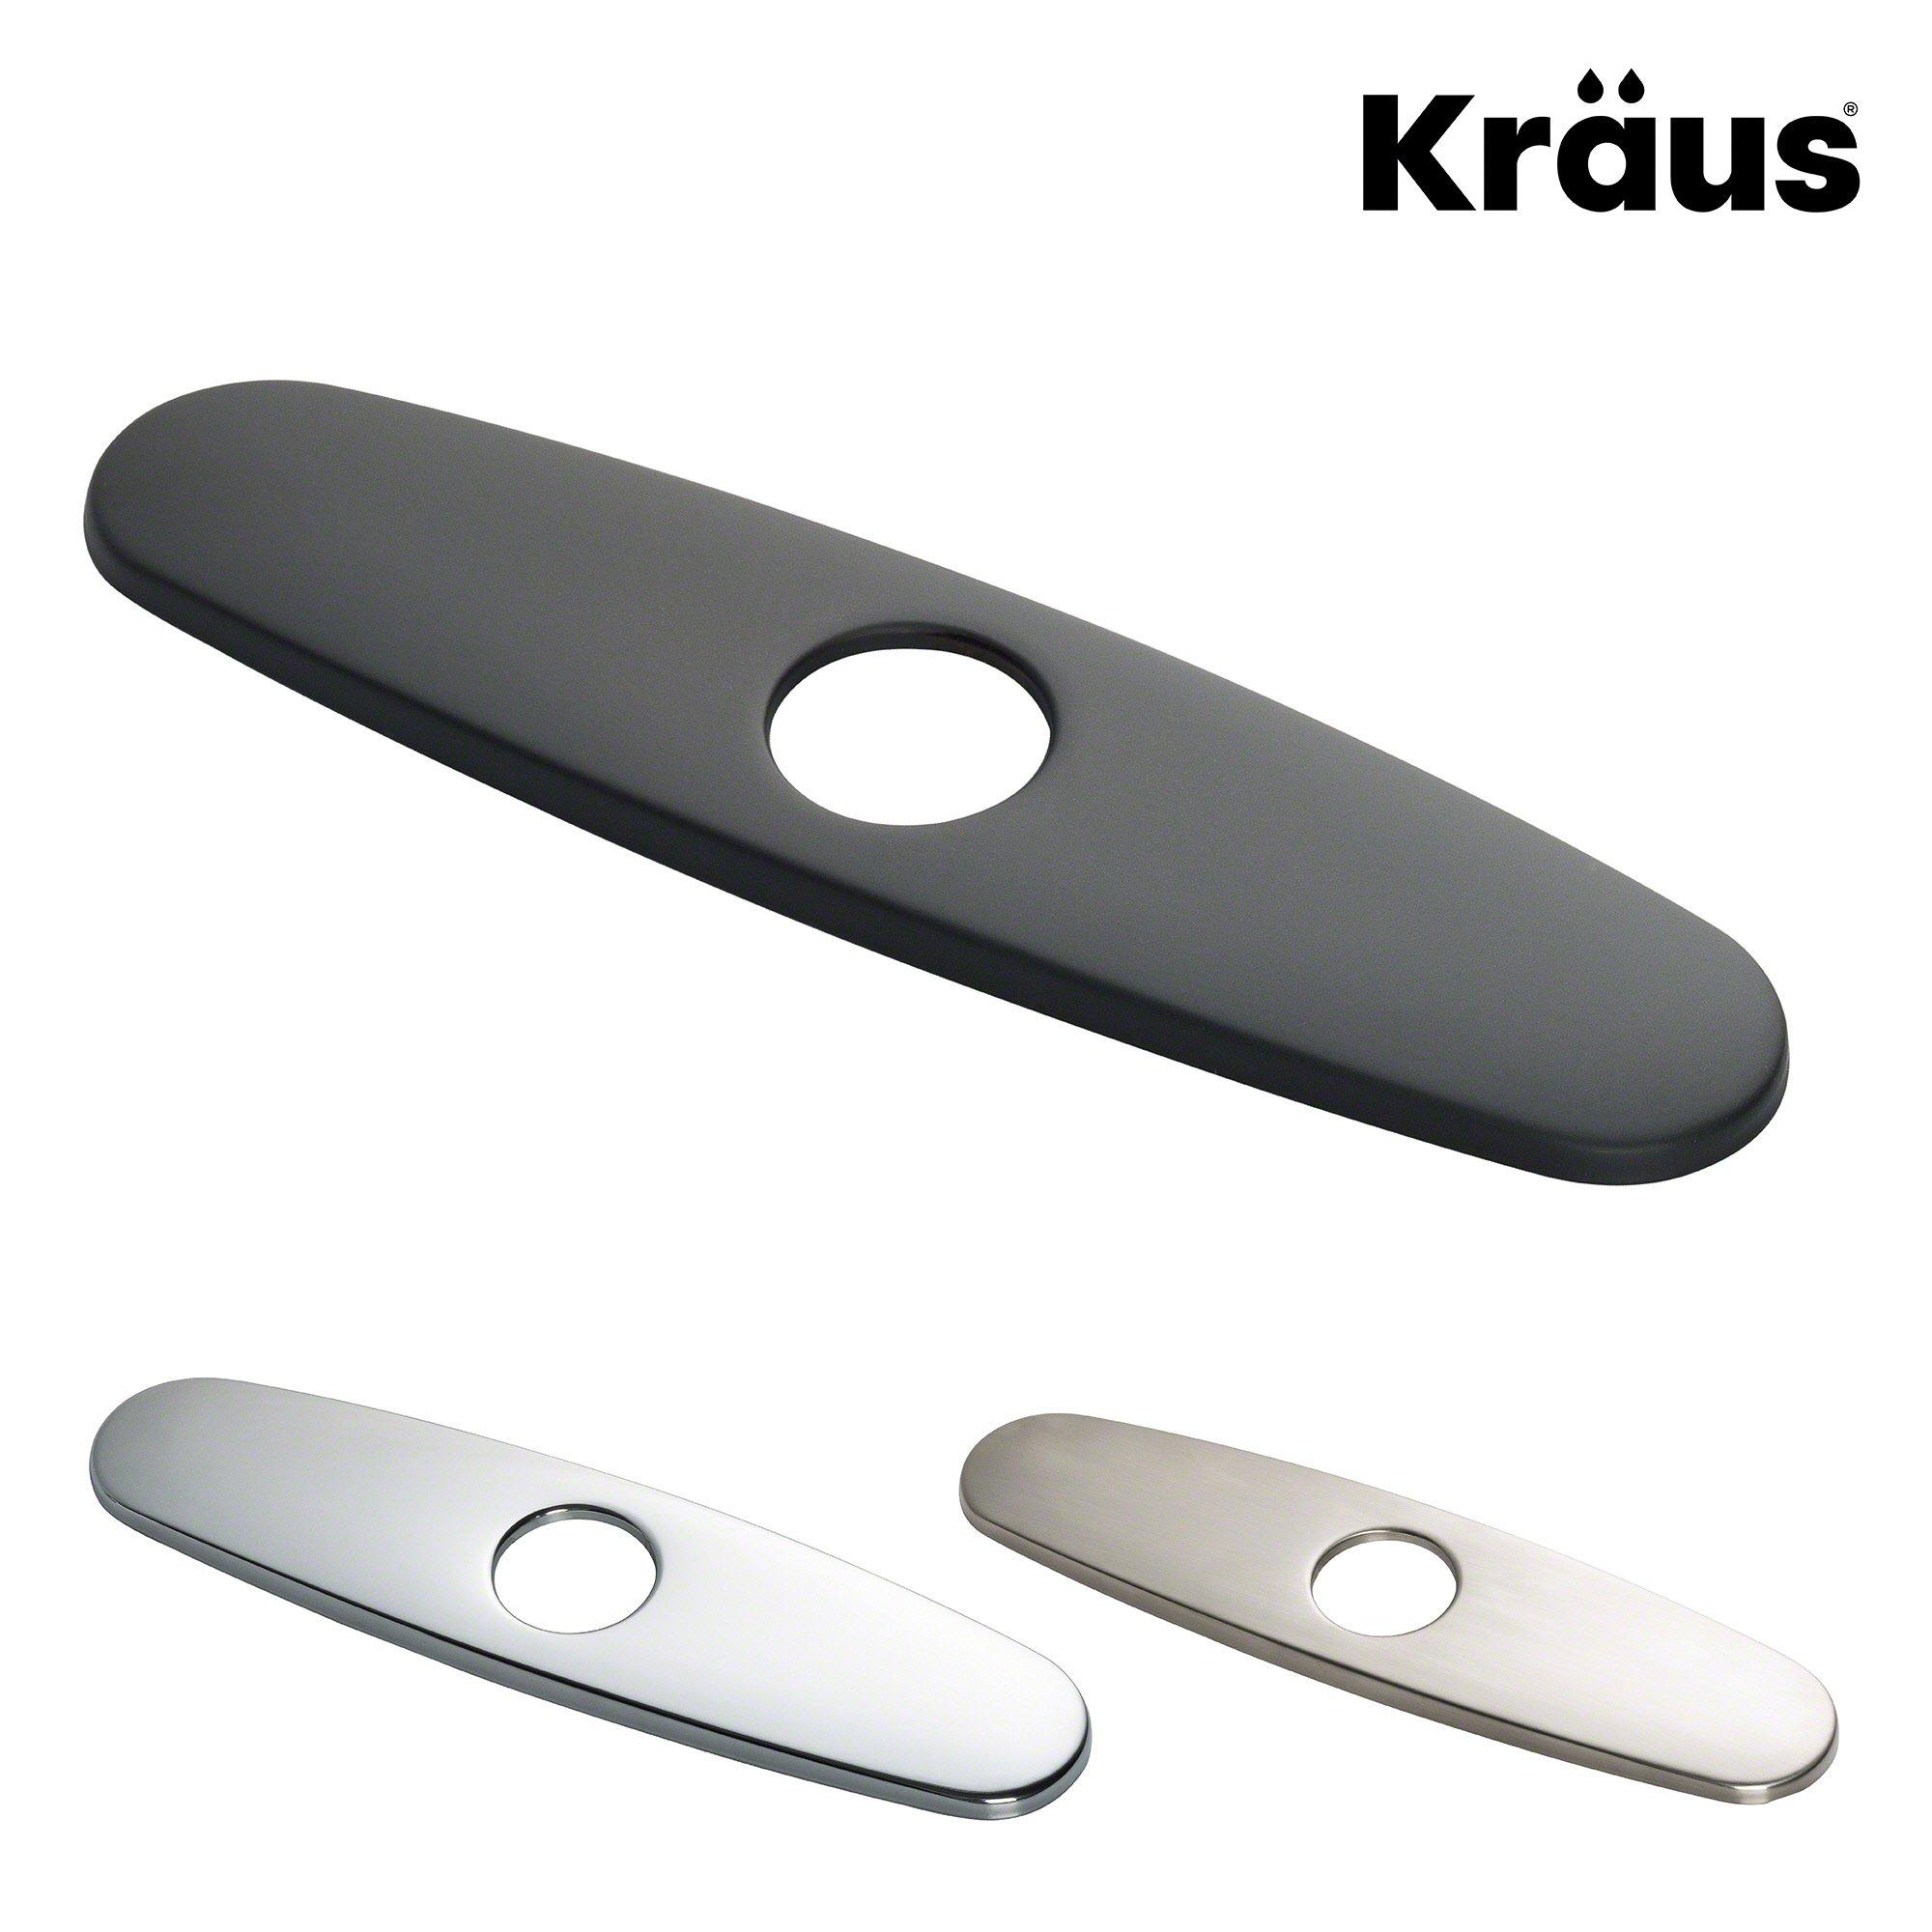 "Kraus Kitchen Faucet 10"" Deck Plate in Matte Black"